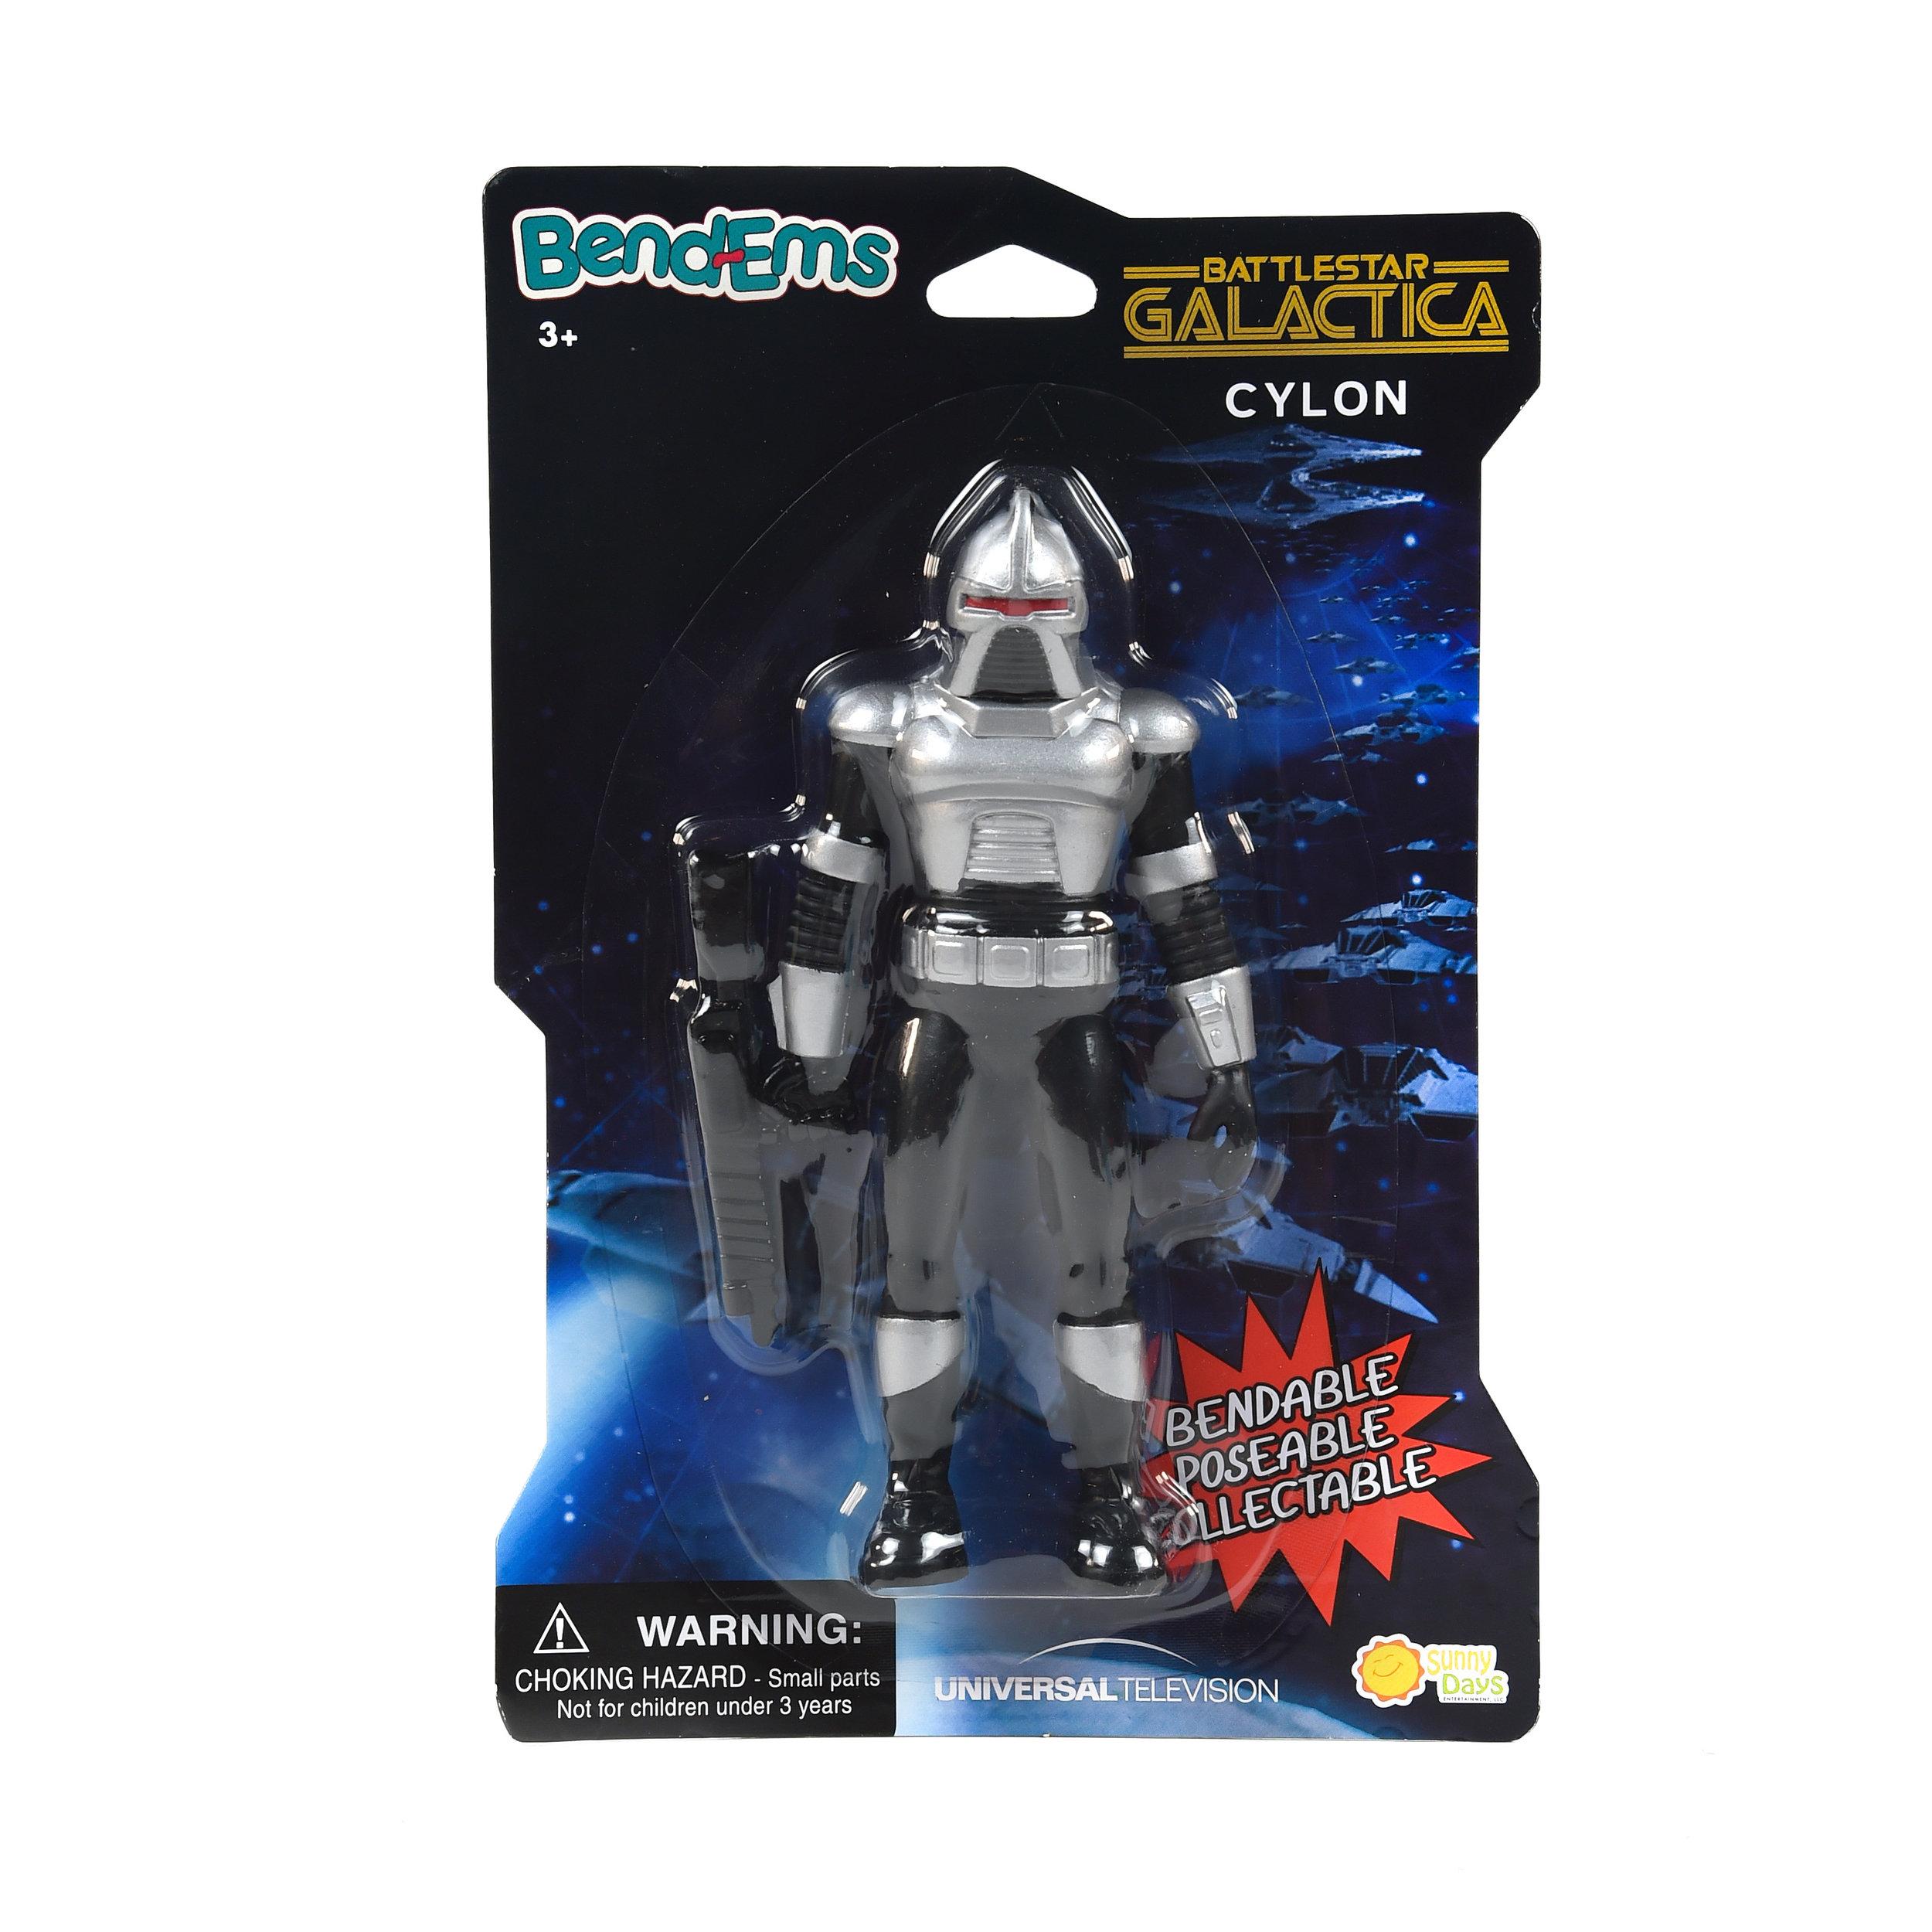 Battle Star Galactica: Cylon